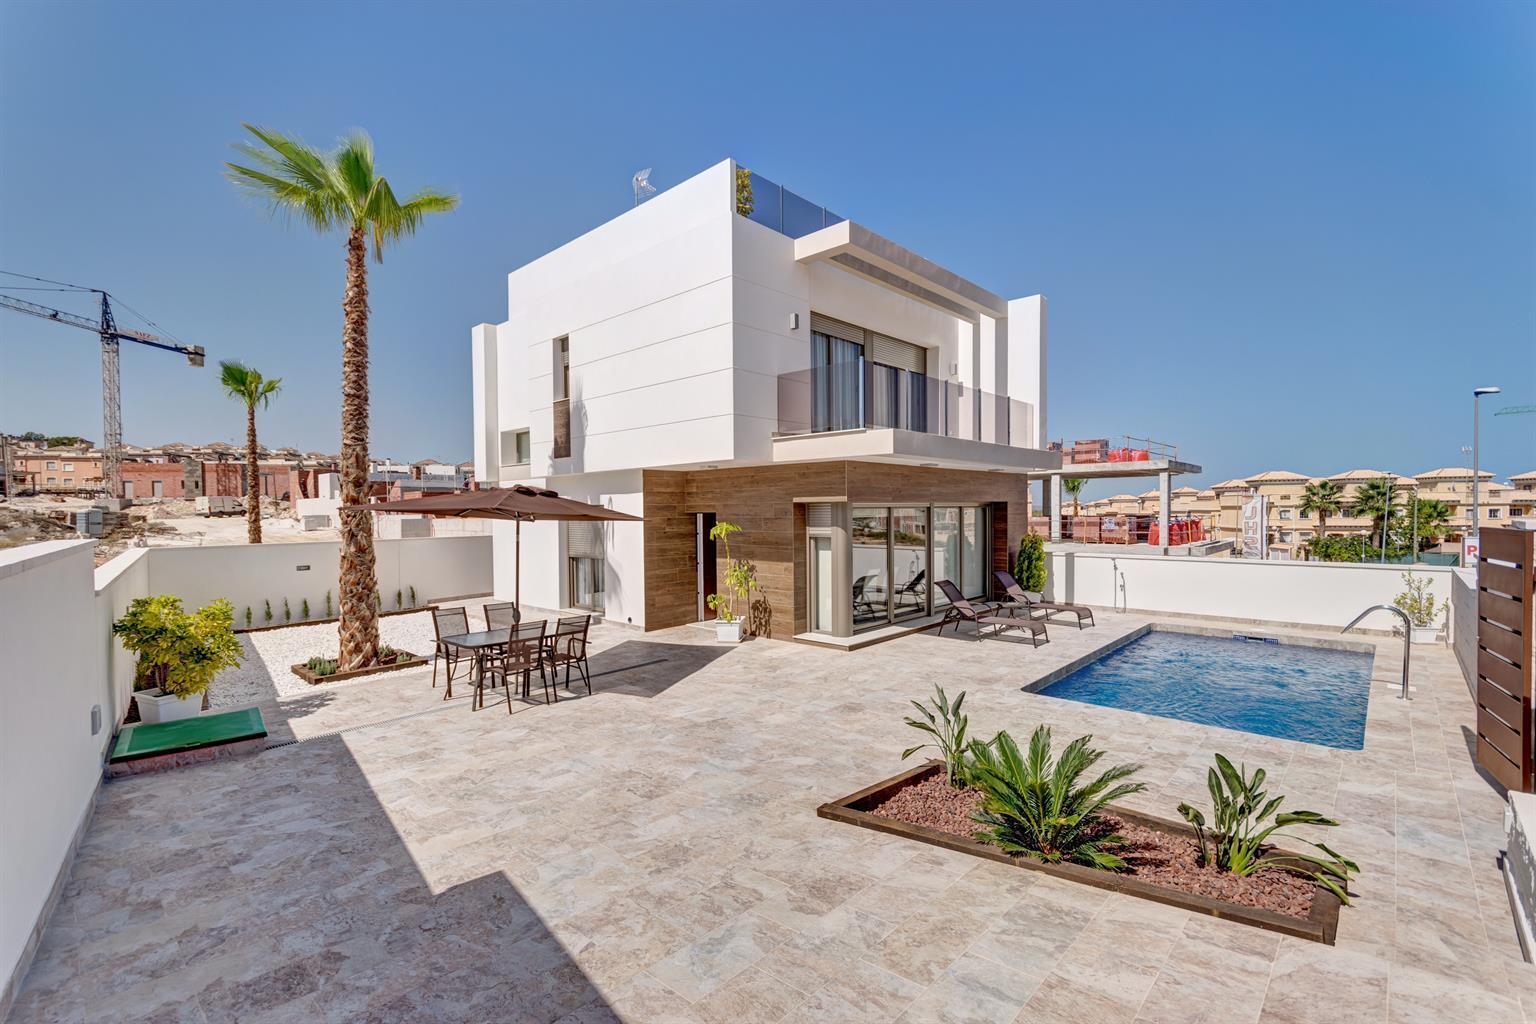 Maison - San Miguel De Salinas - #4227968-0